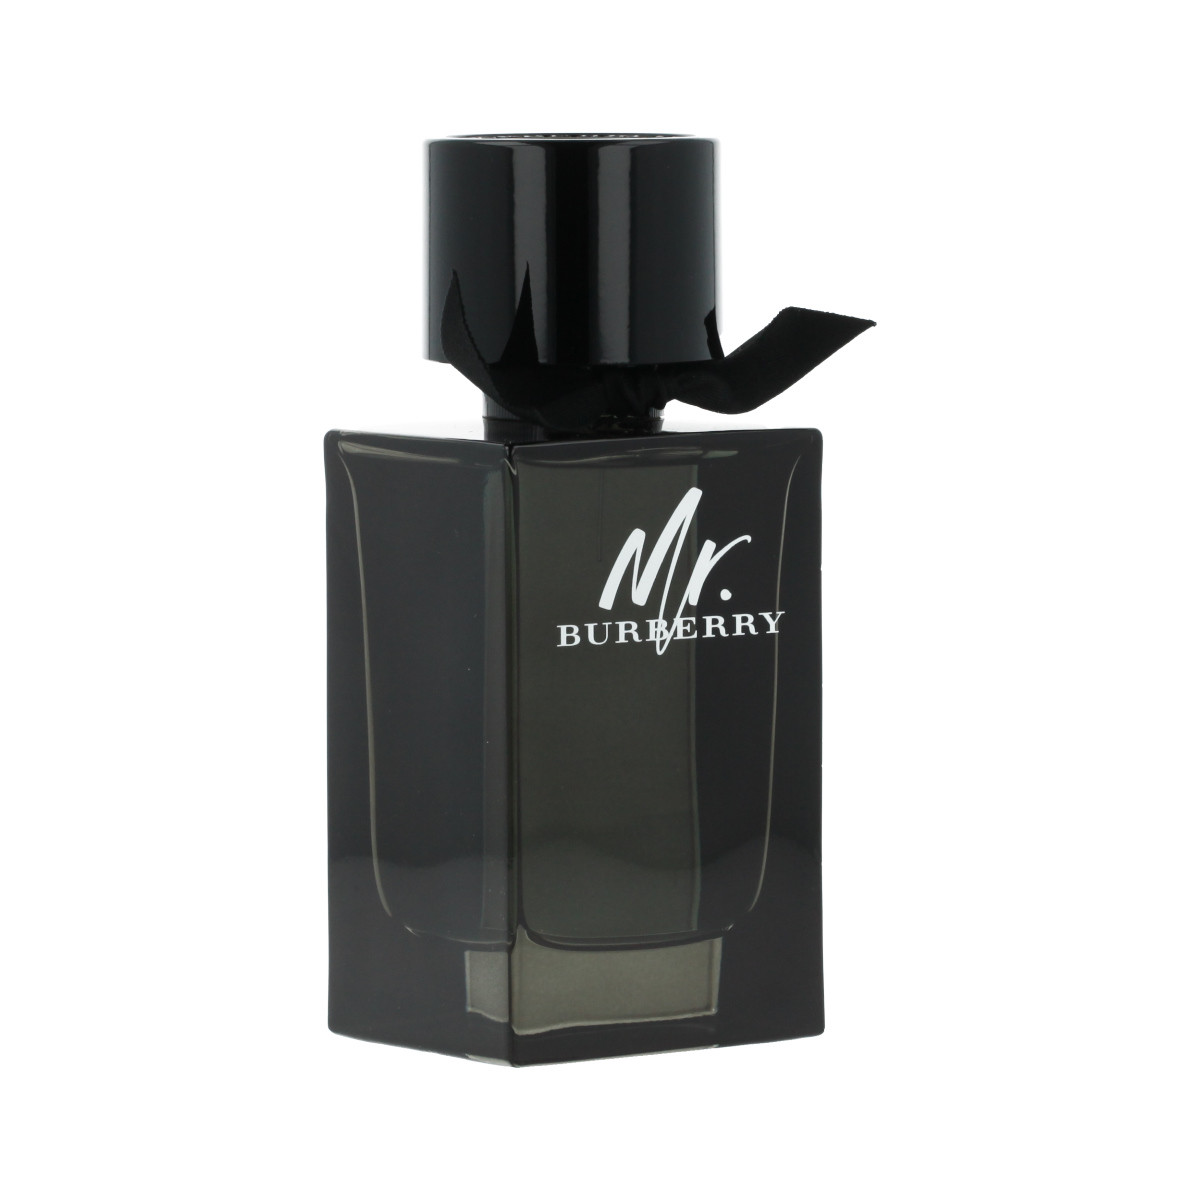 a7d40429dee8 Burberry Mr. Burberry Eau De Parfum 150 ml (man) - Mr. Burberry Eau ...